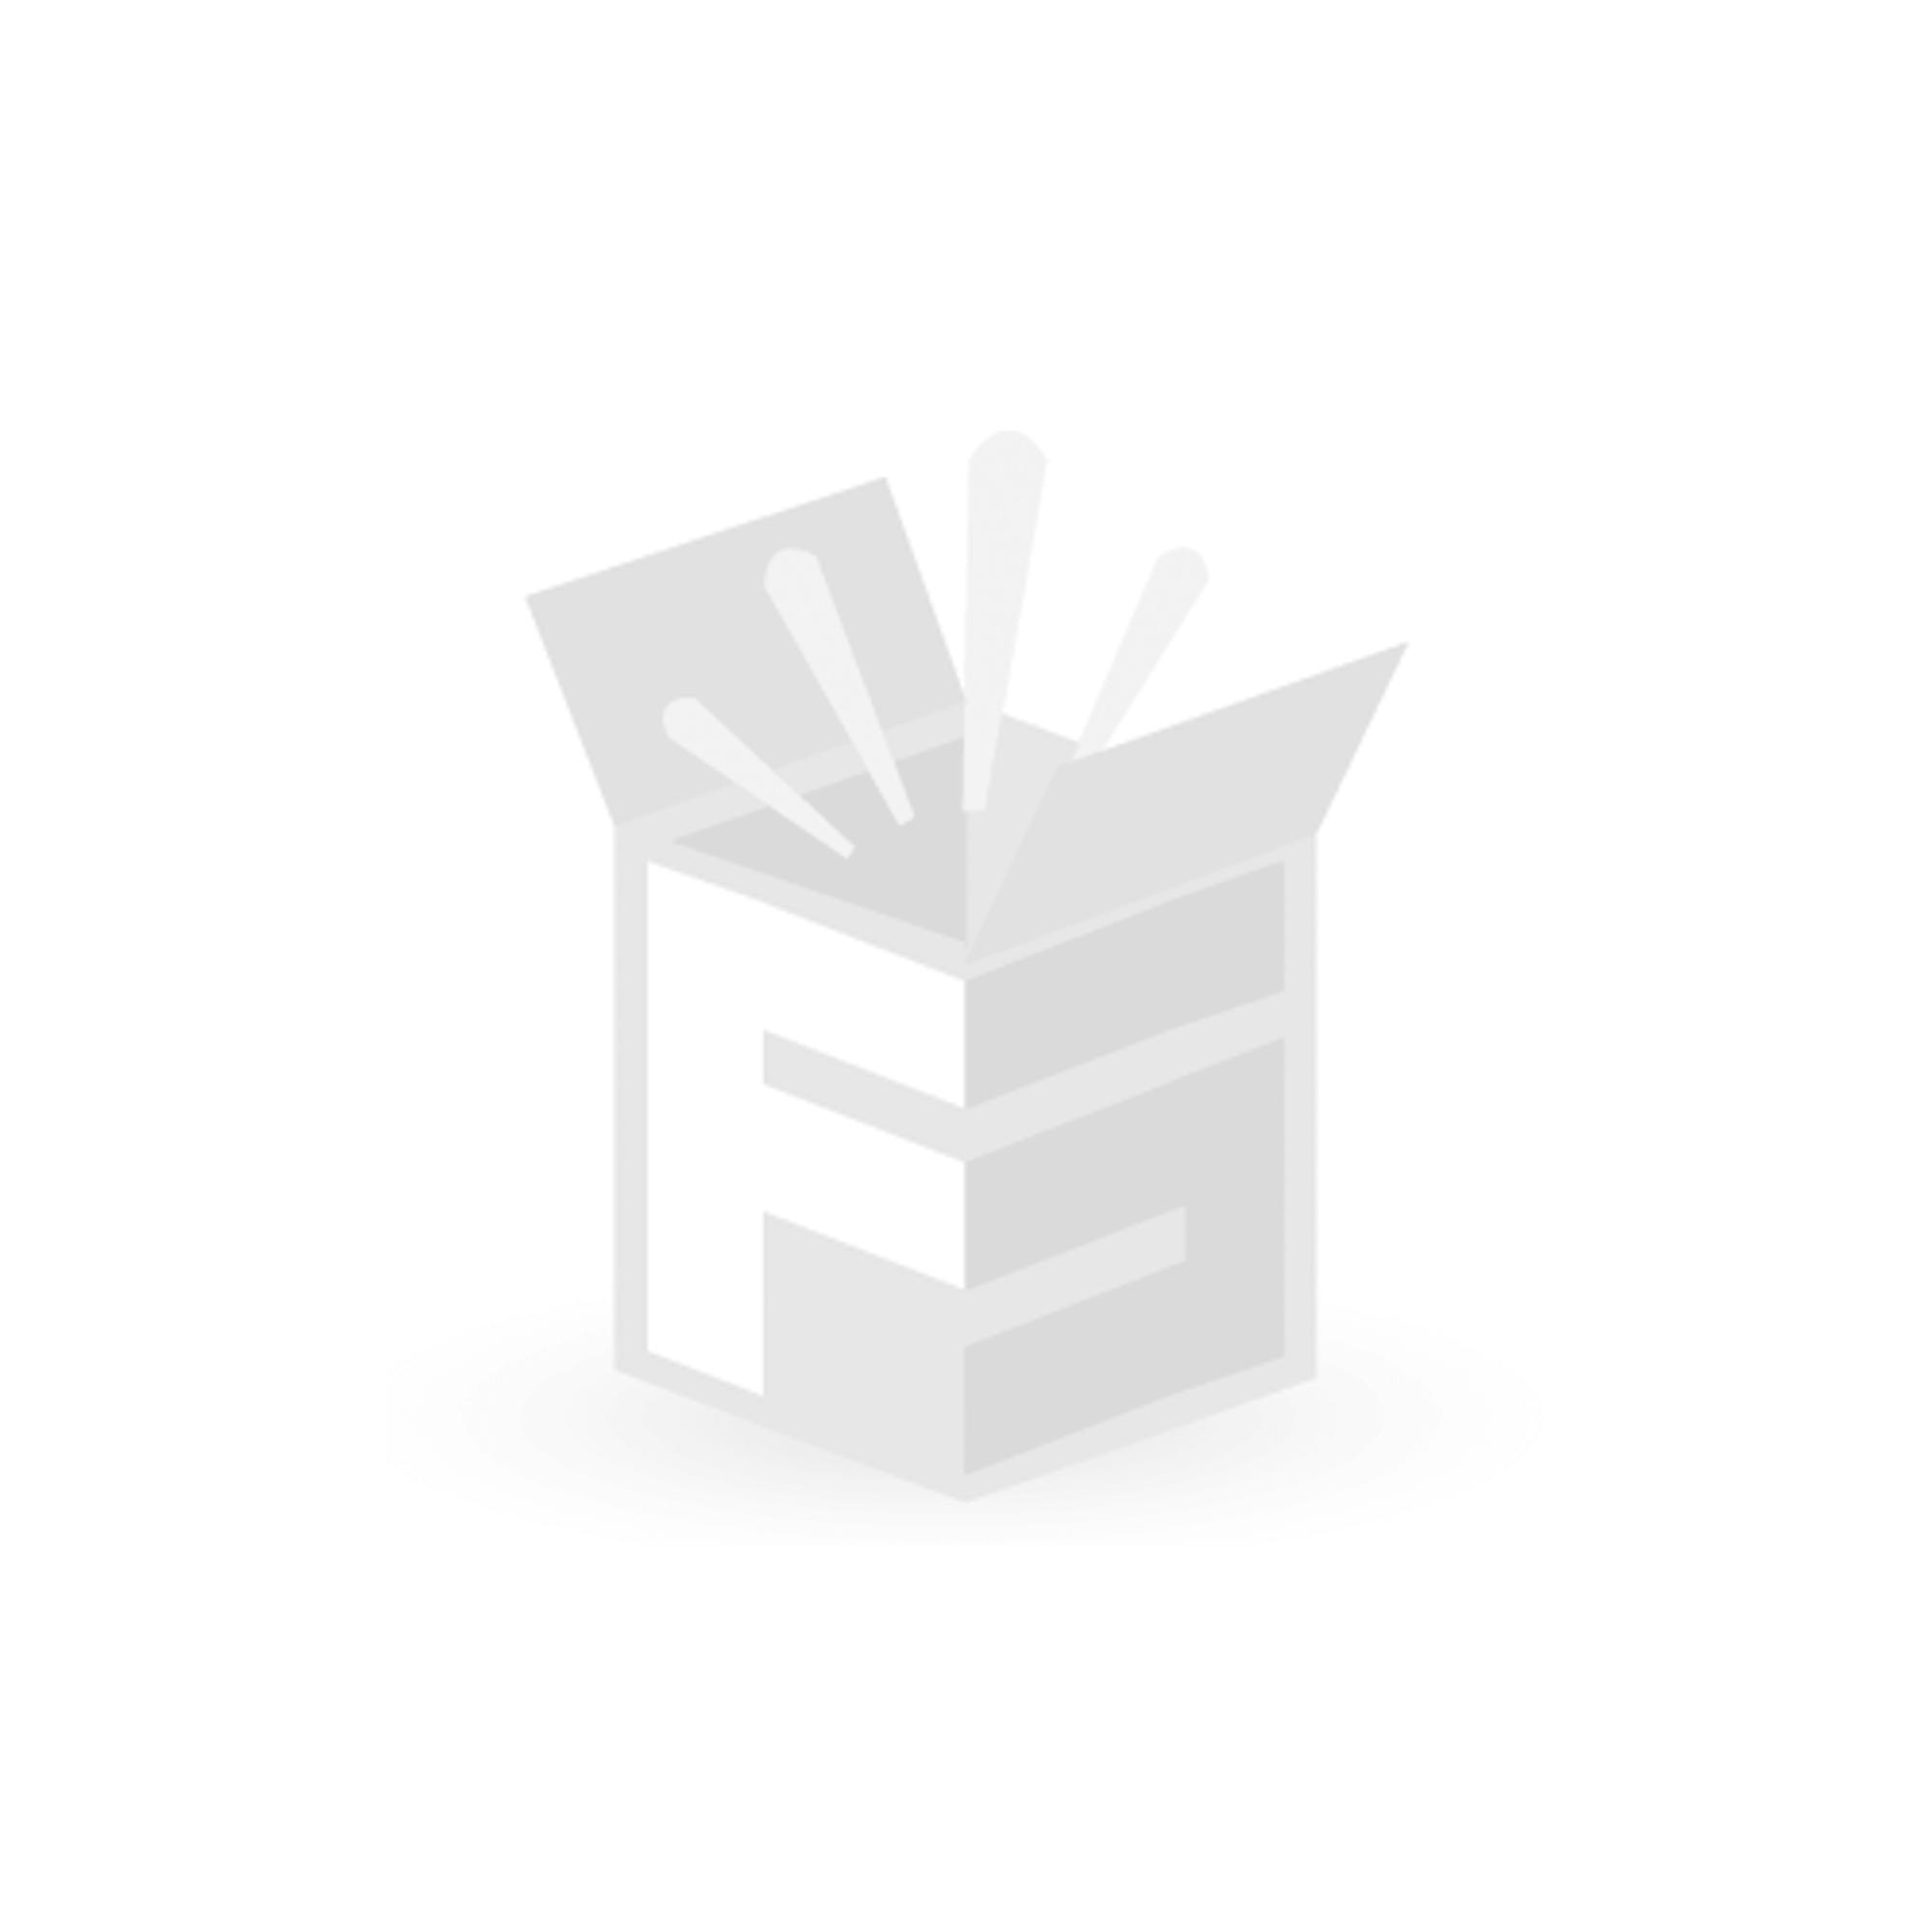 Bosch Metallbohrer-Set ProBox HSS-R 118°, 19-teilig